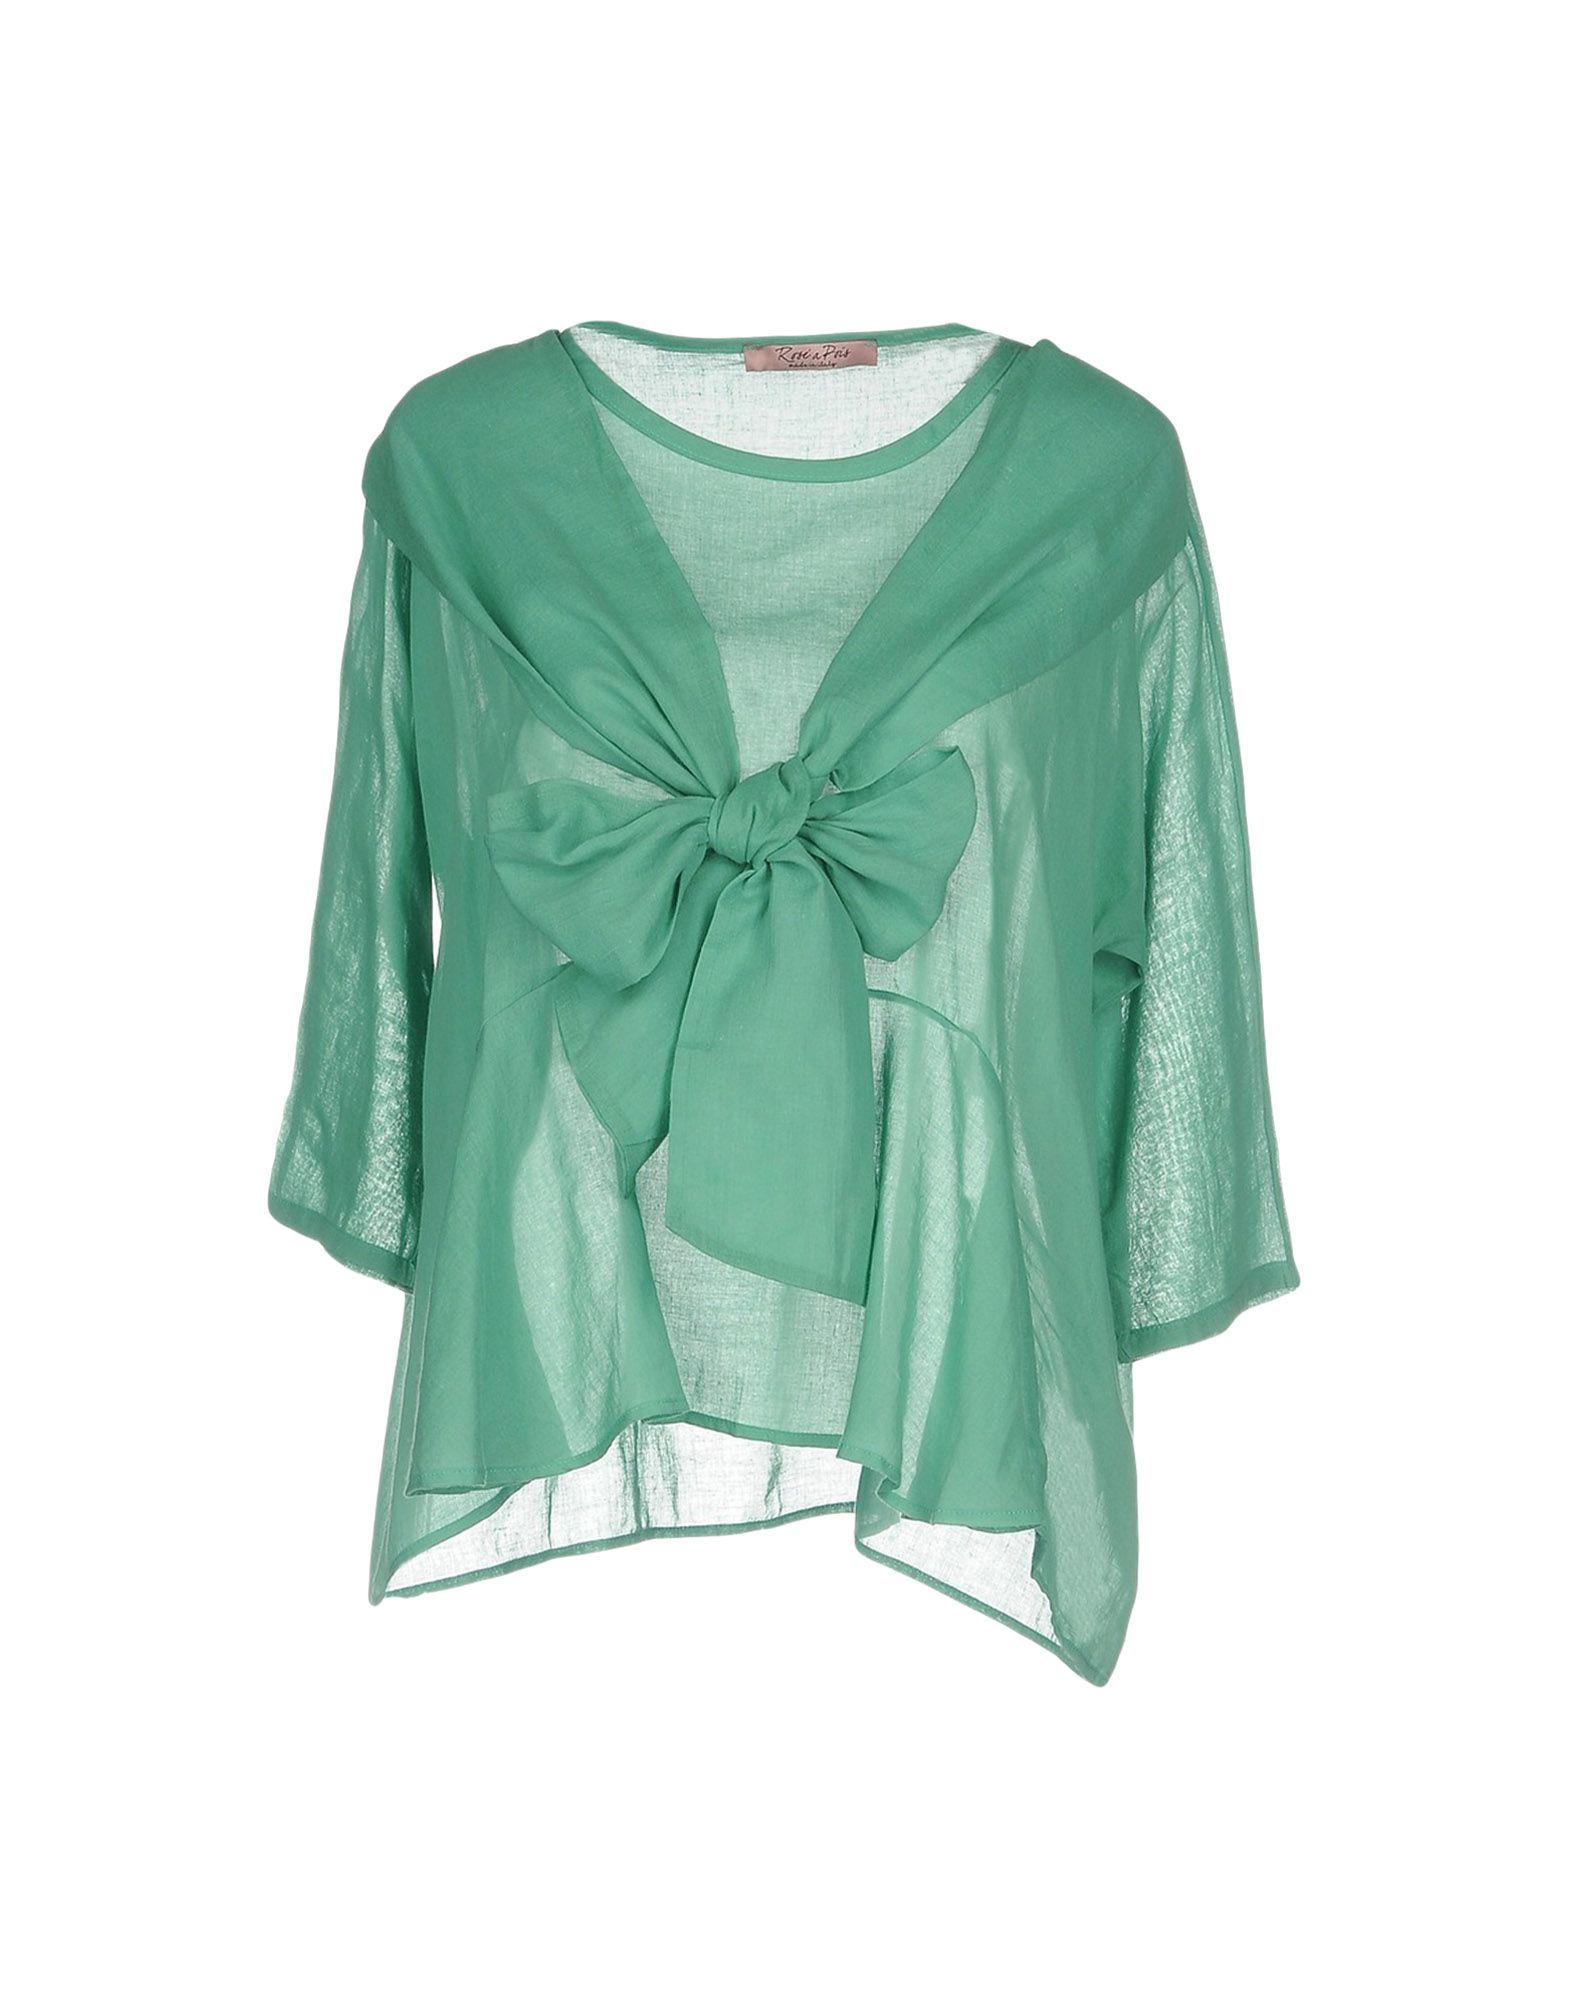 ROSE' A POIS Блузка pois блузка